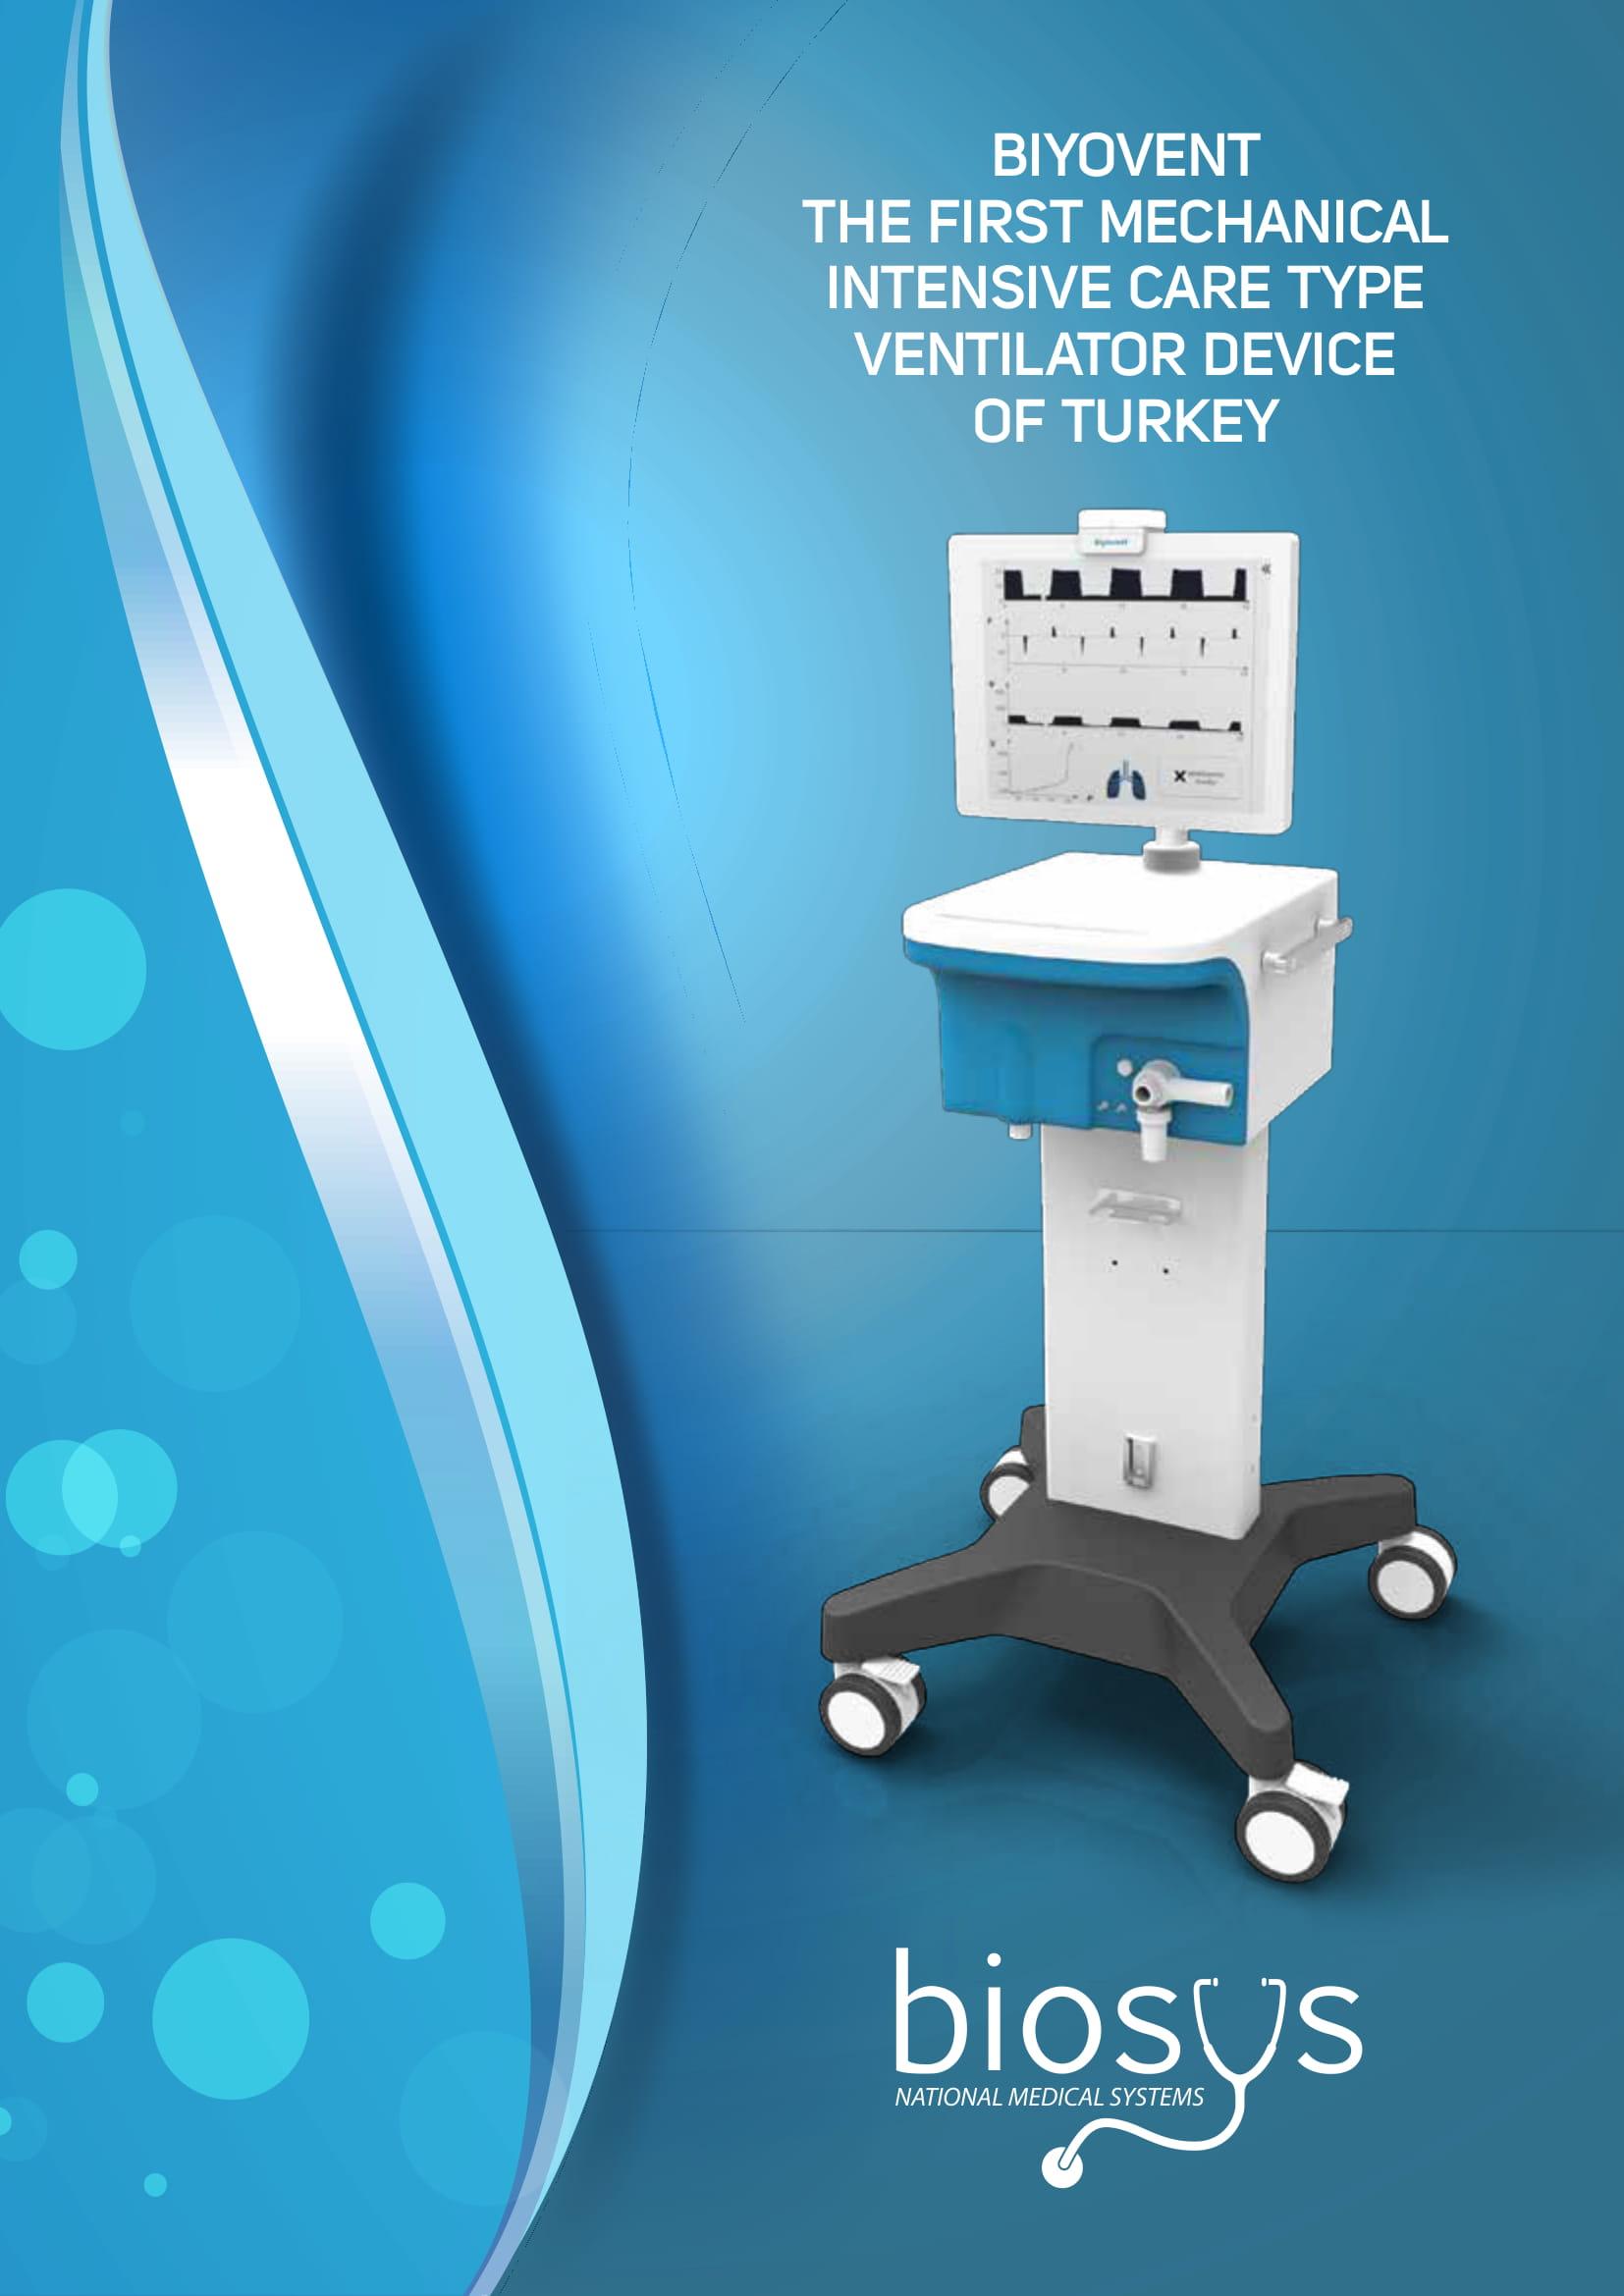 biosys ventilator